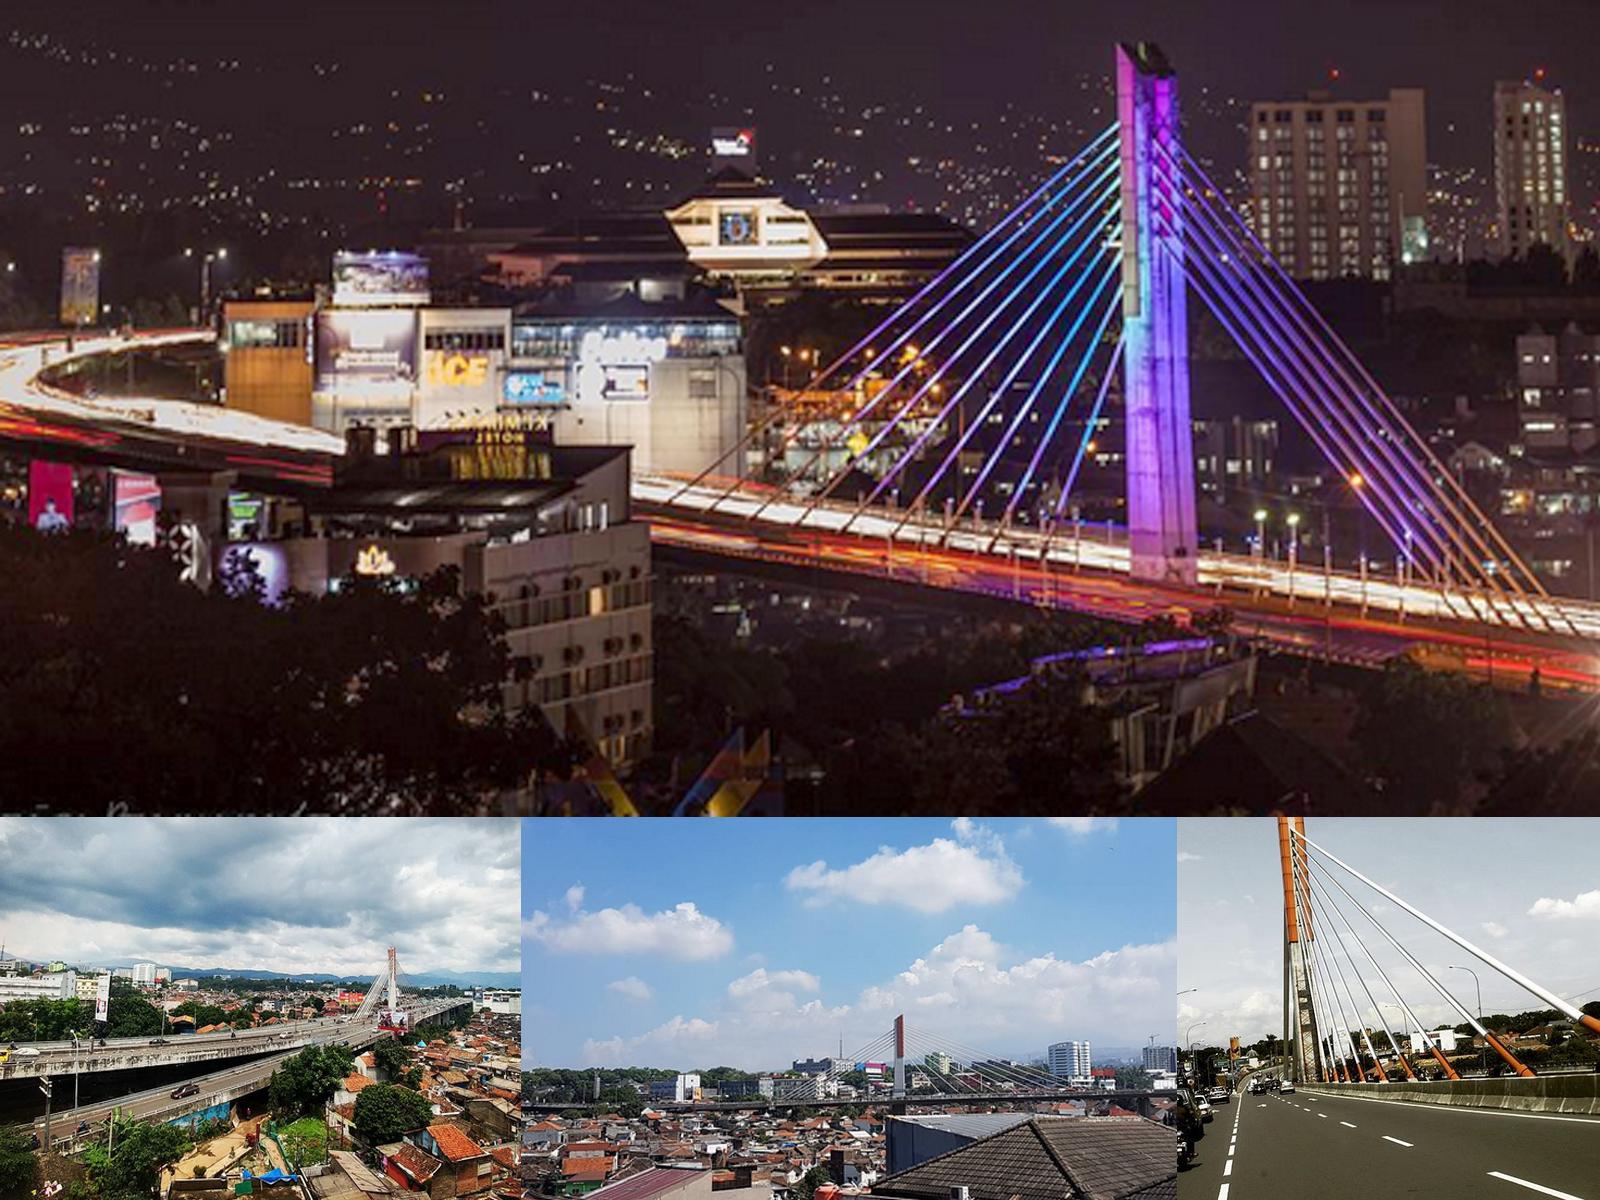 Sejarah Profil Jembatan Layang Flyover Pasupati Wisata Bandung Taman Kab